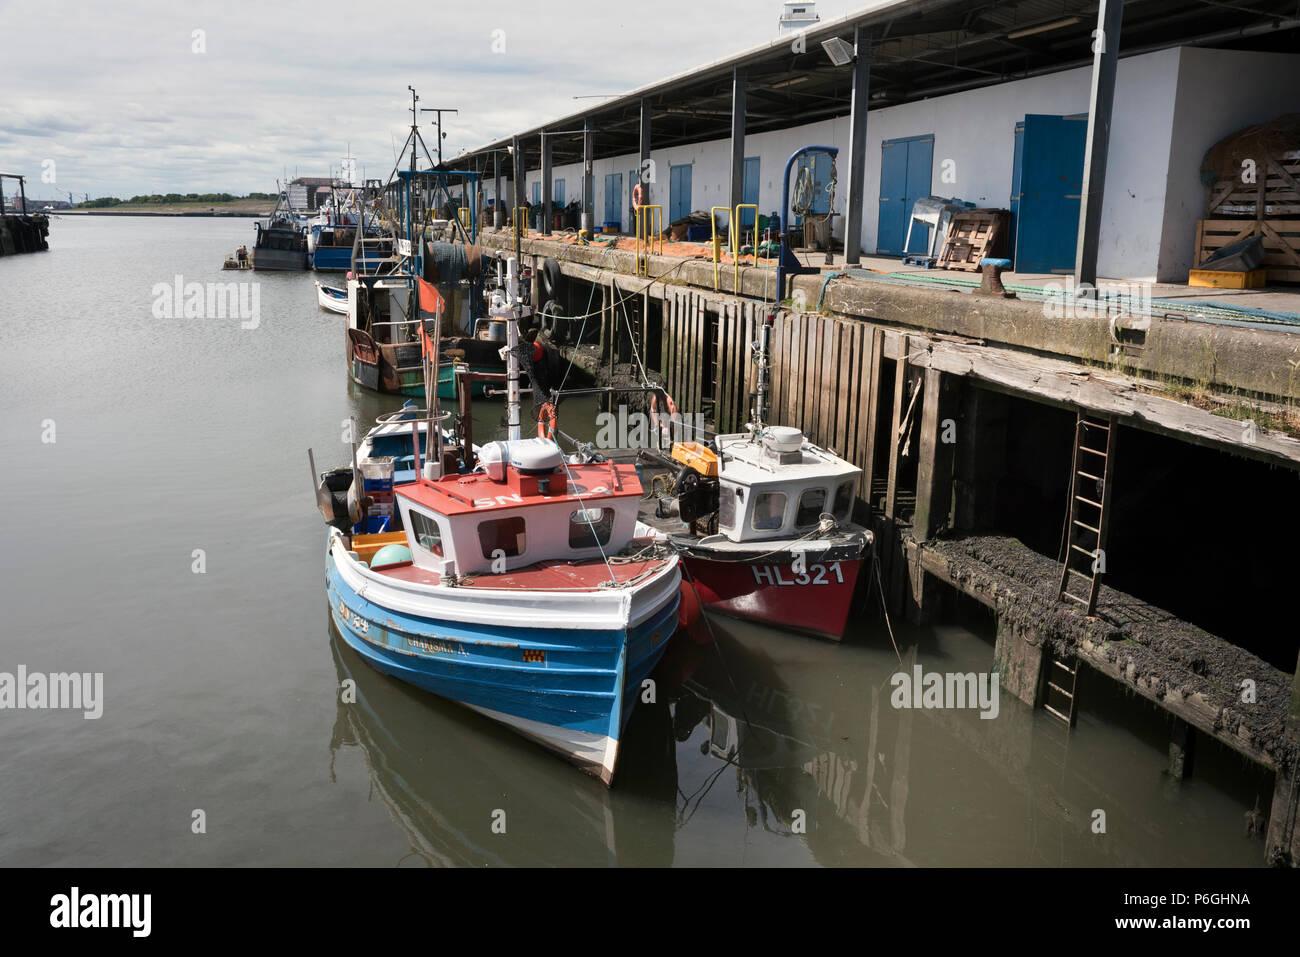 The Fishing Quay at North Shields, Tyneside, UK - Stock Image